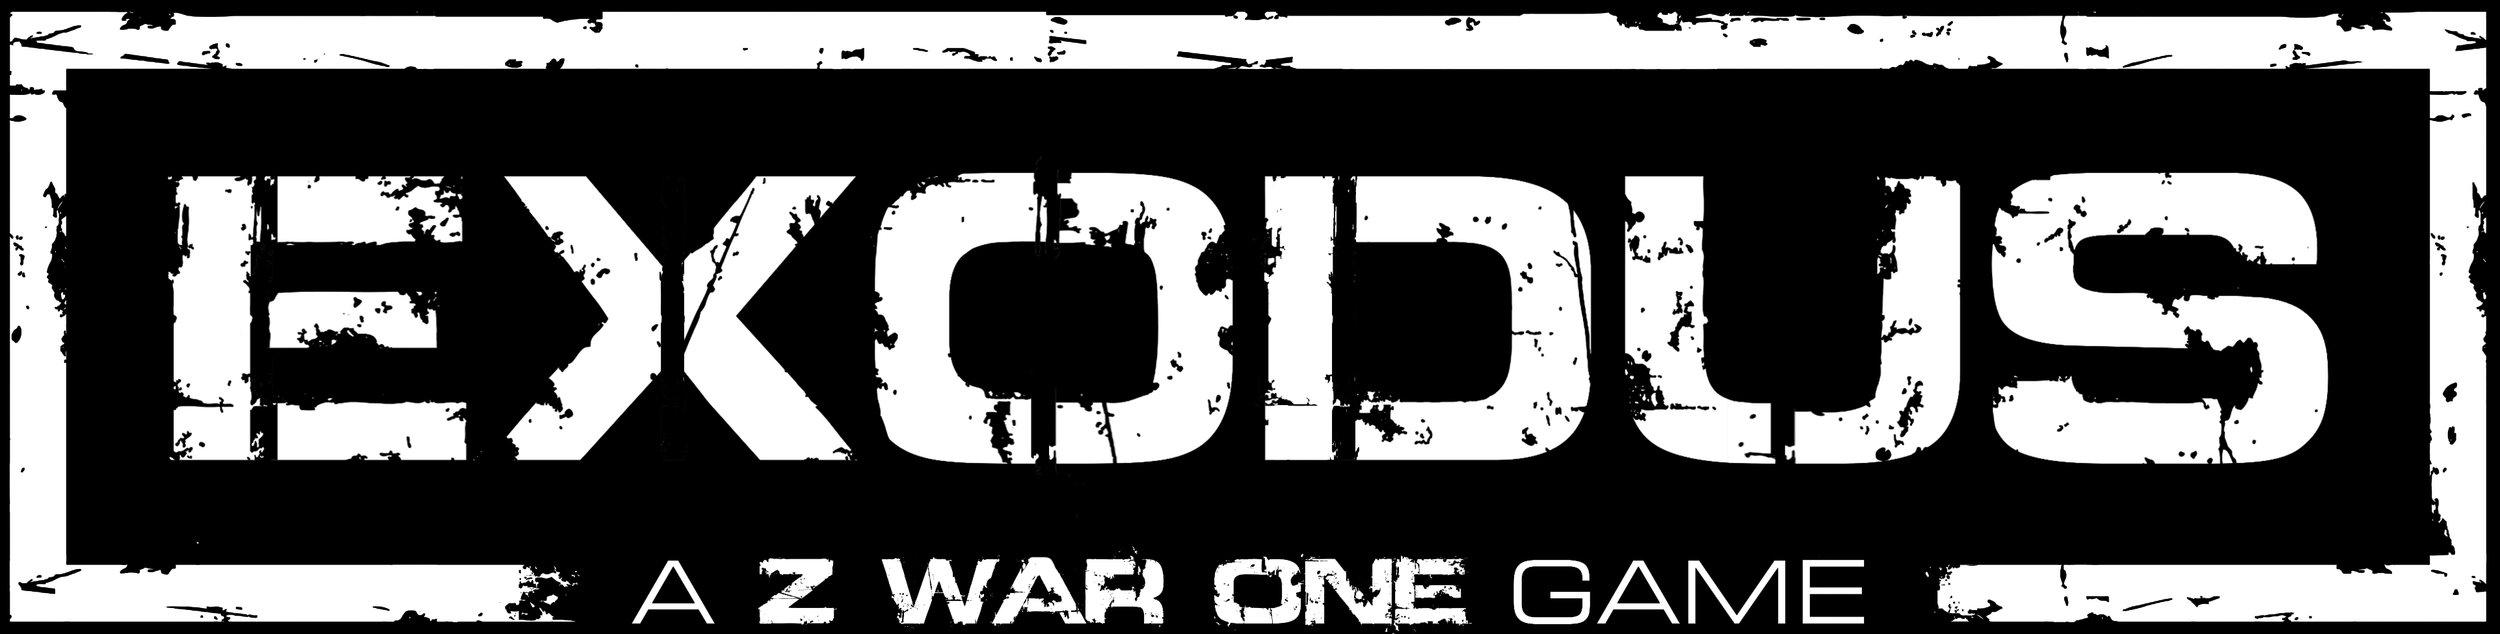 exodus logo.jpg